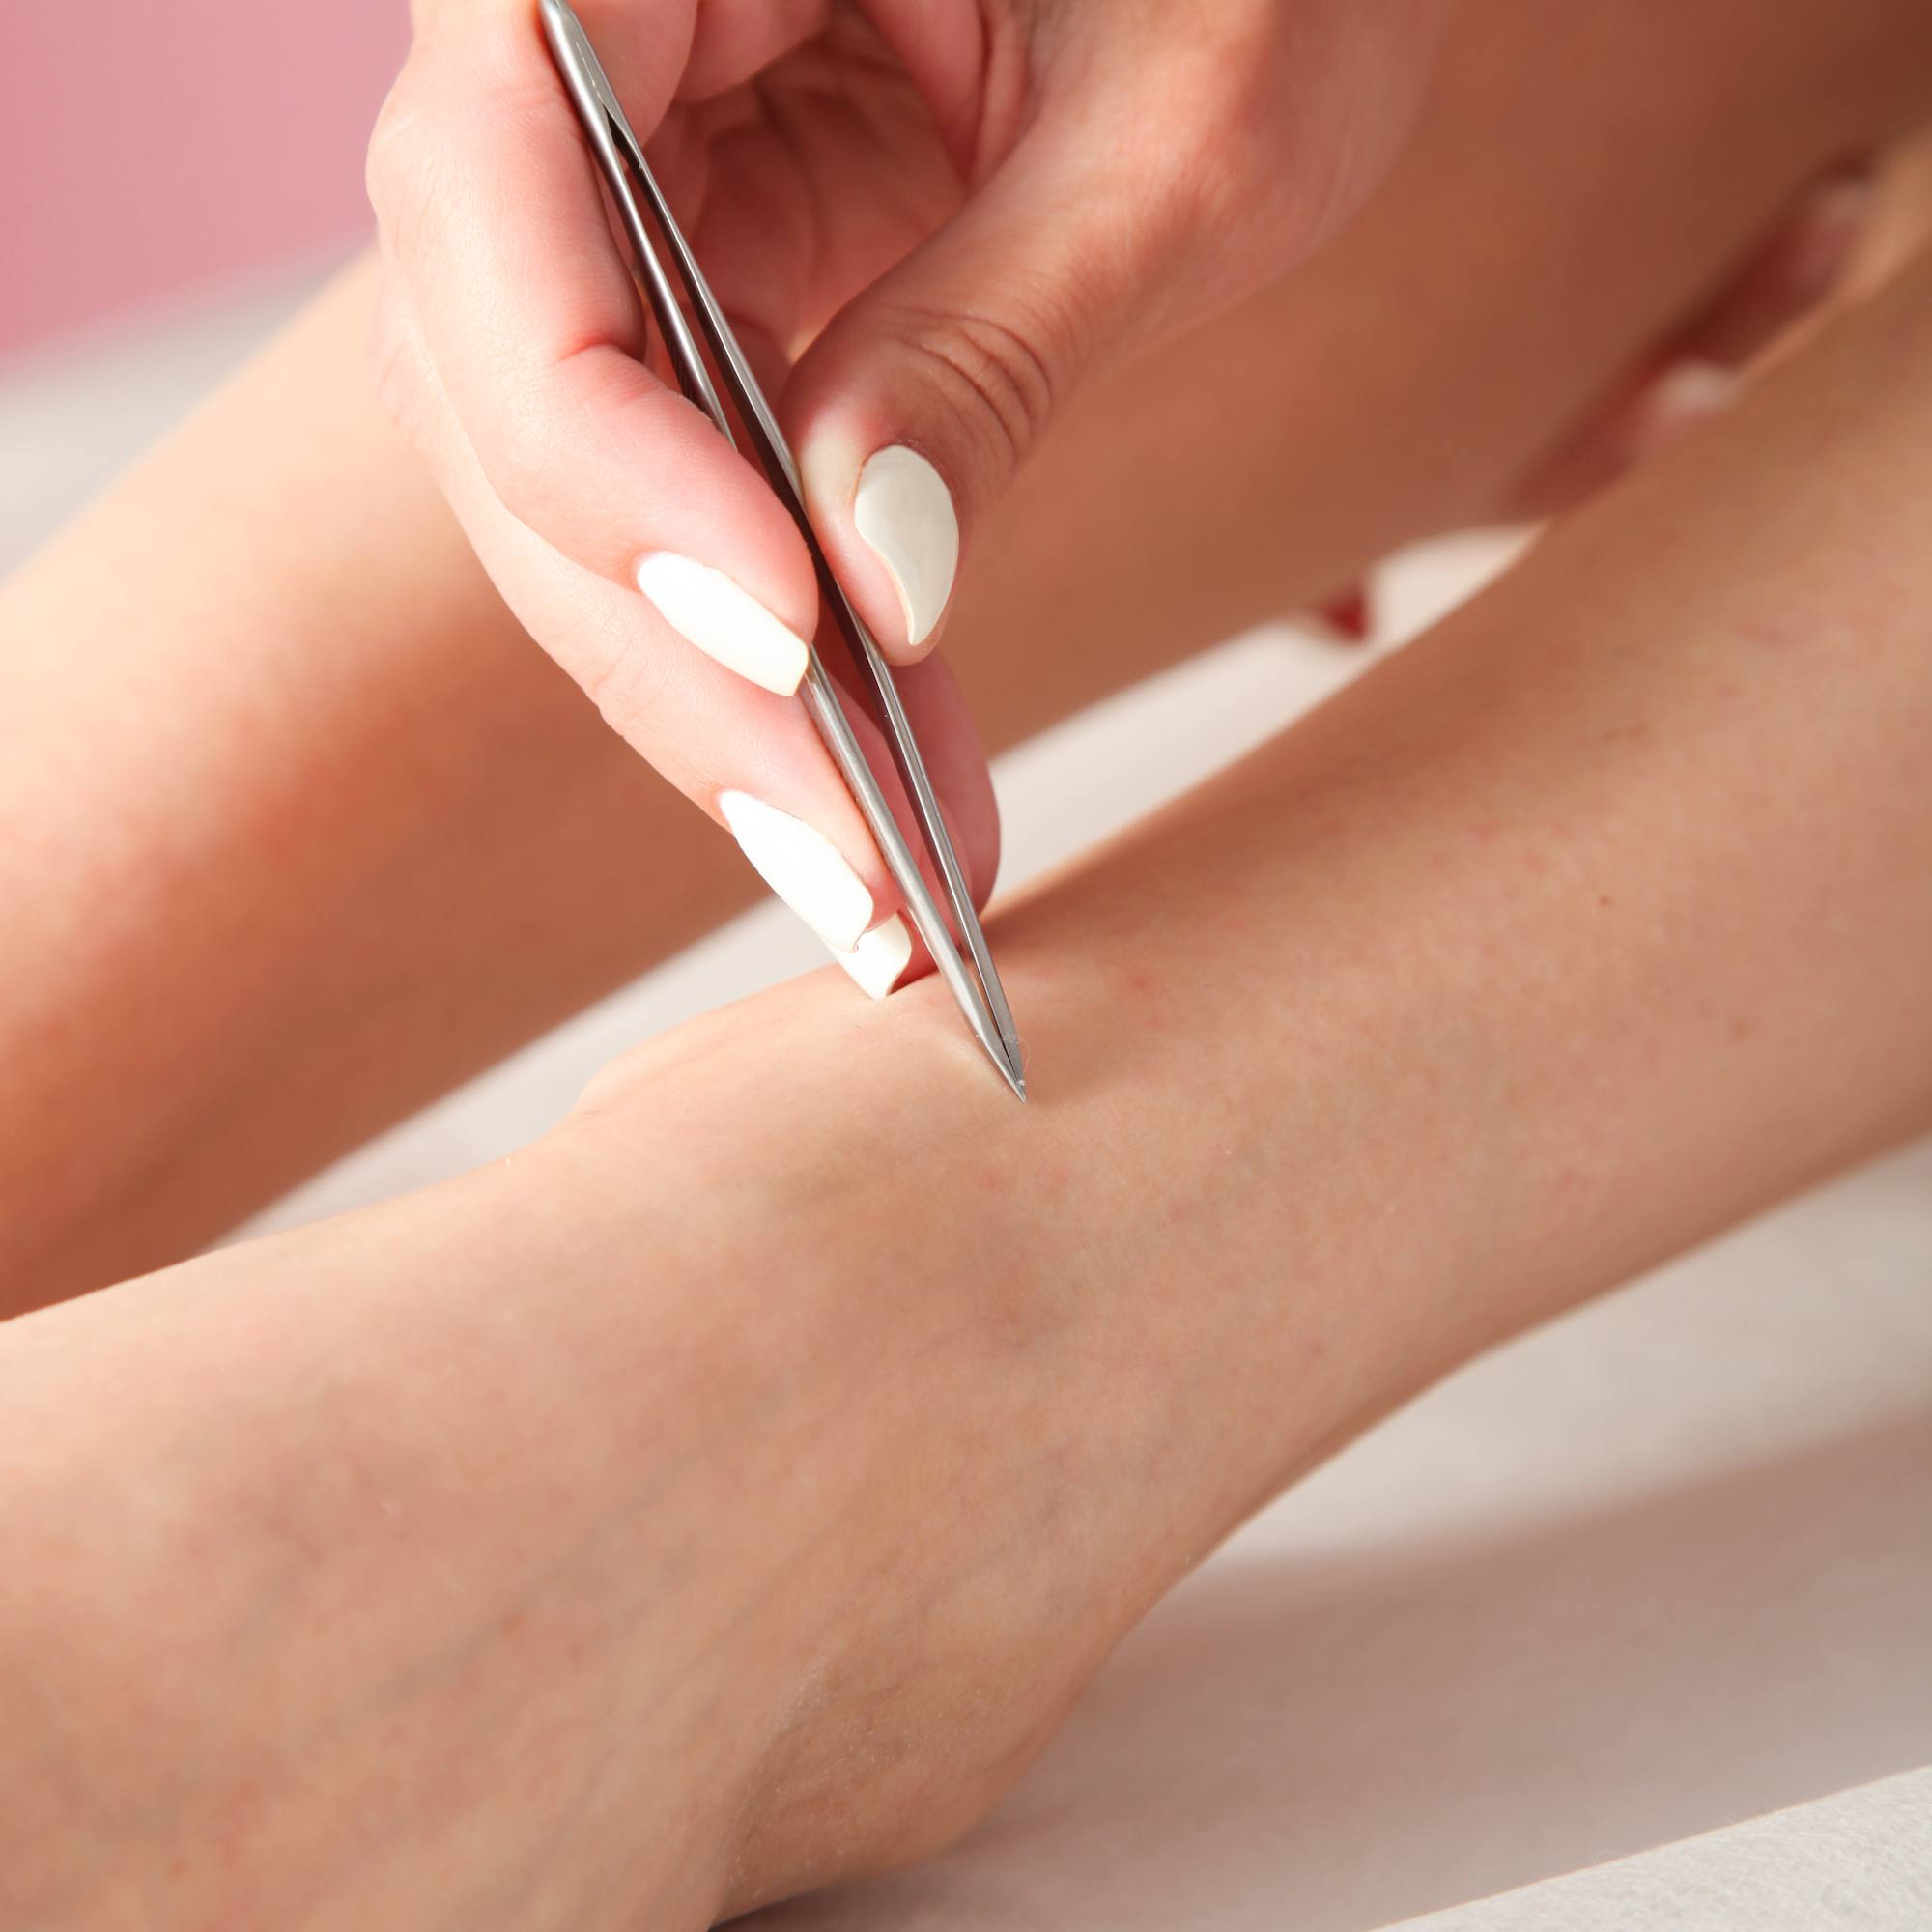 person tweezing leg hair